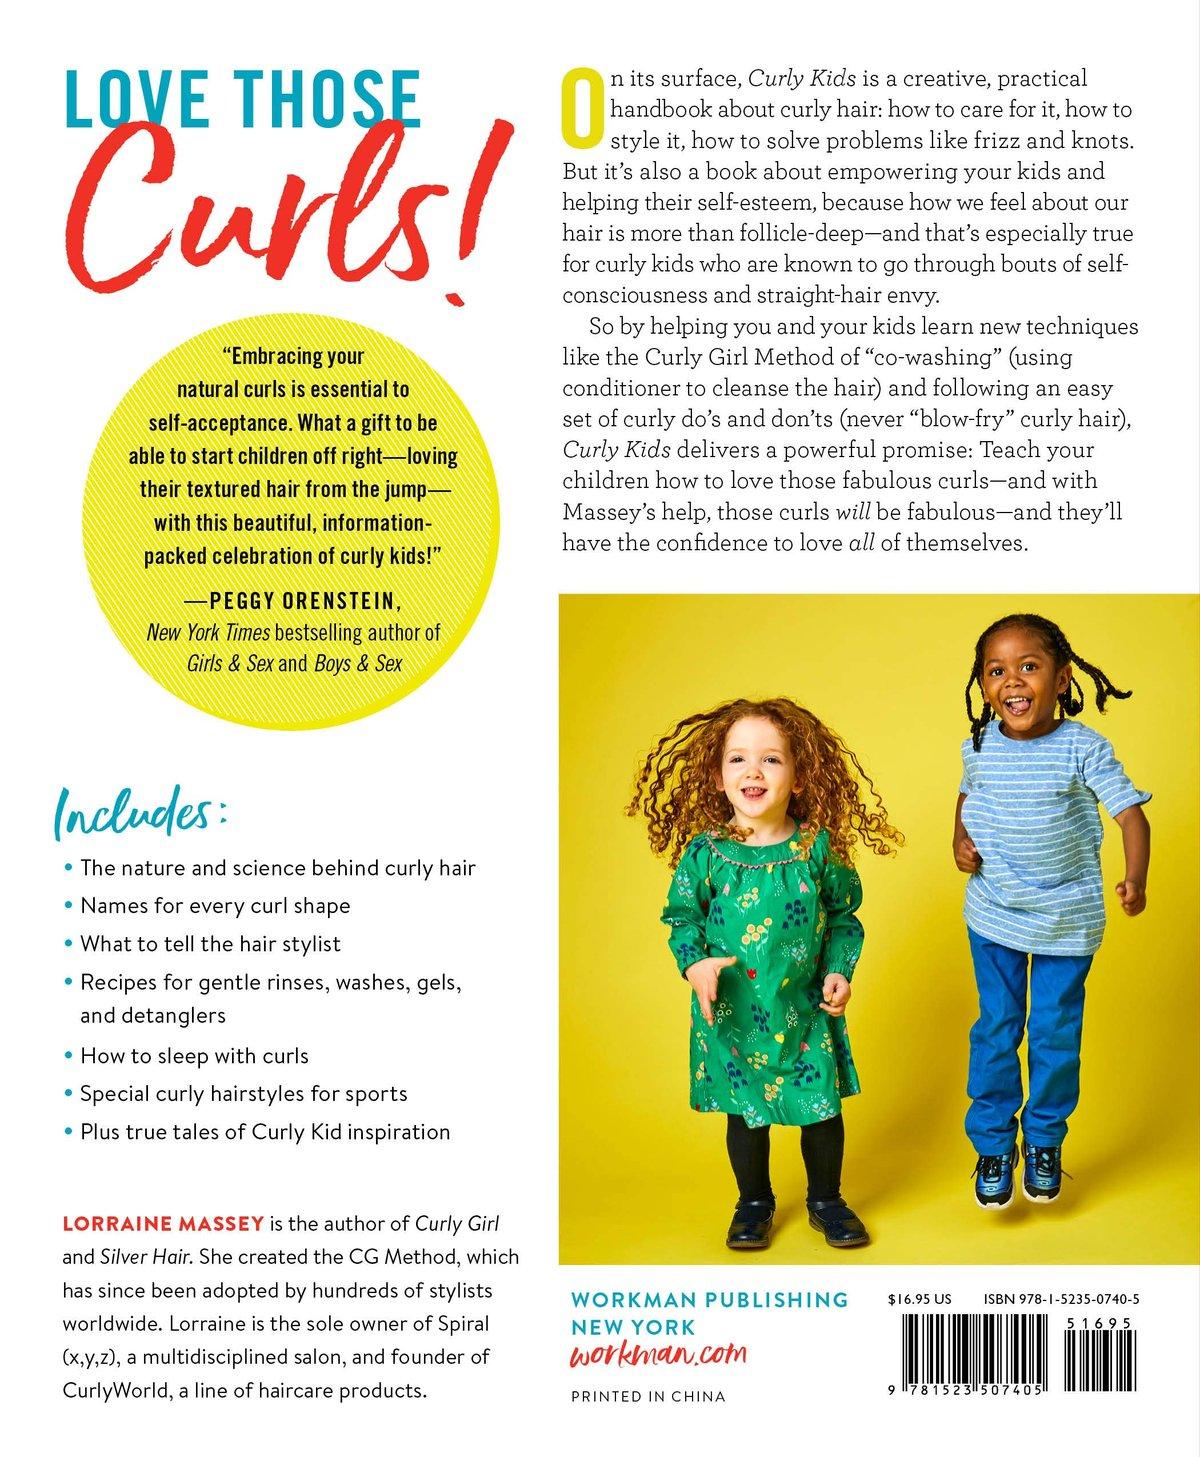 Image of 'Curly Kids: The Handbook' by Lorraine Massey & Michele Bender